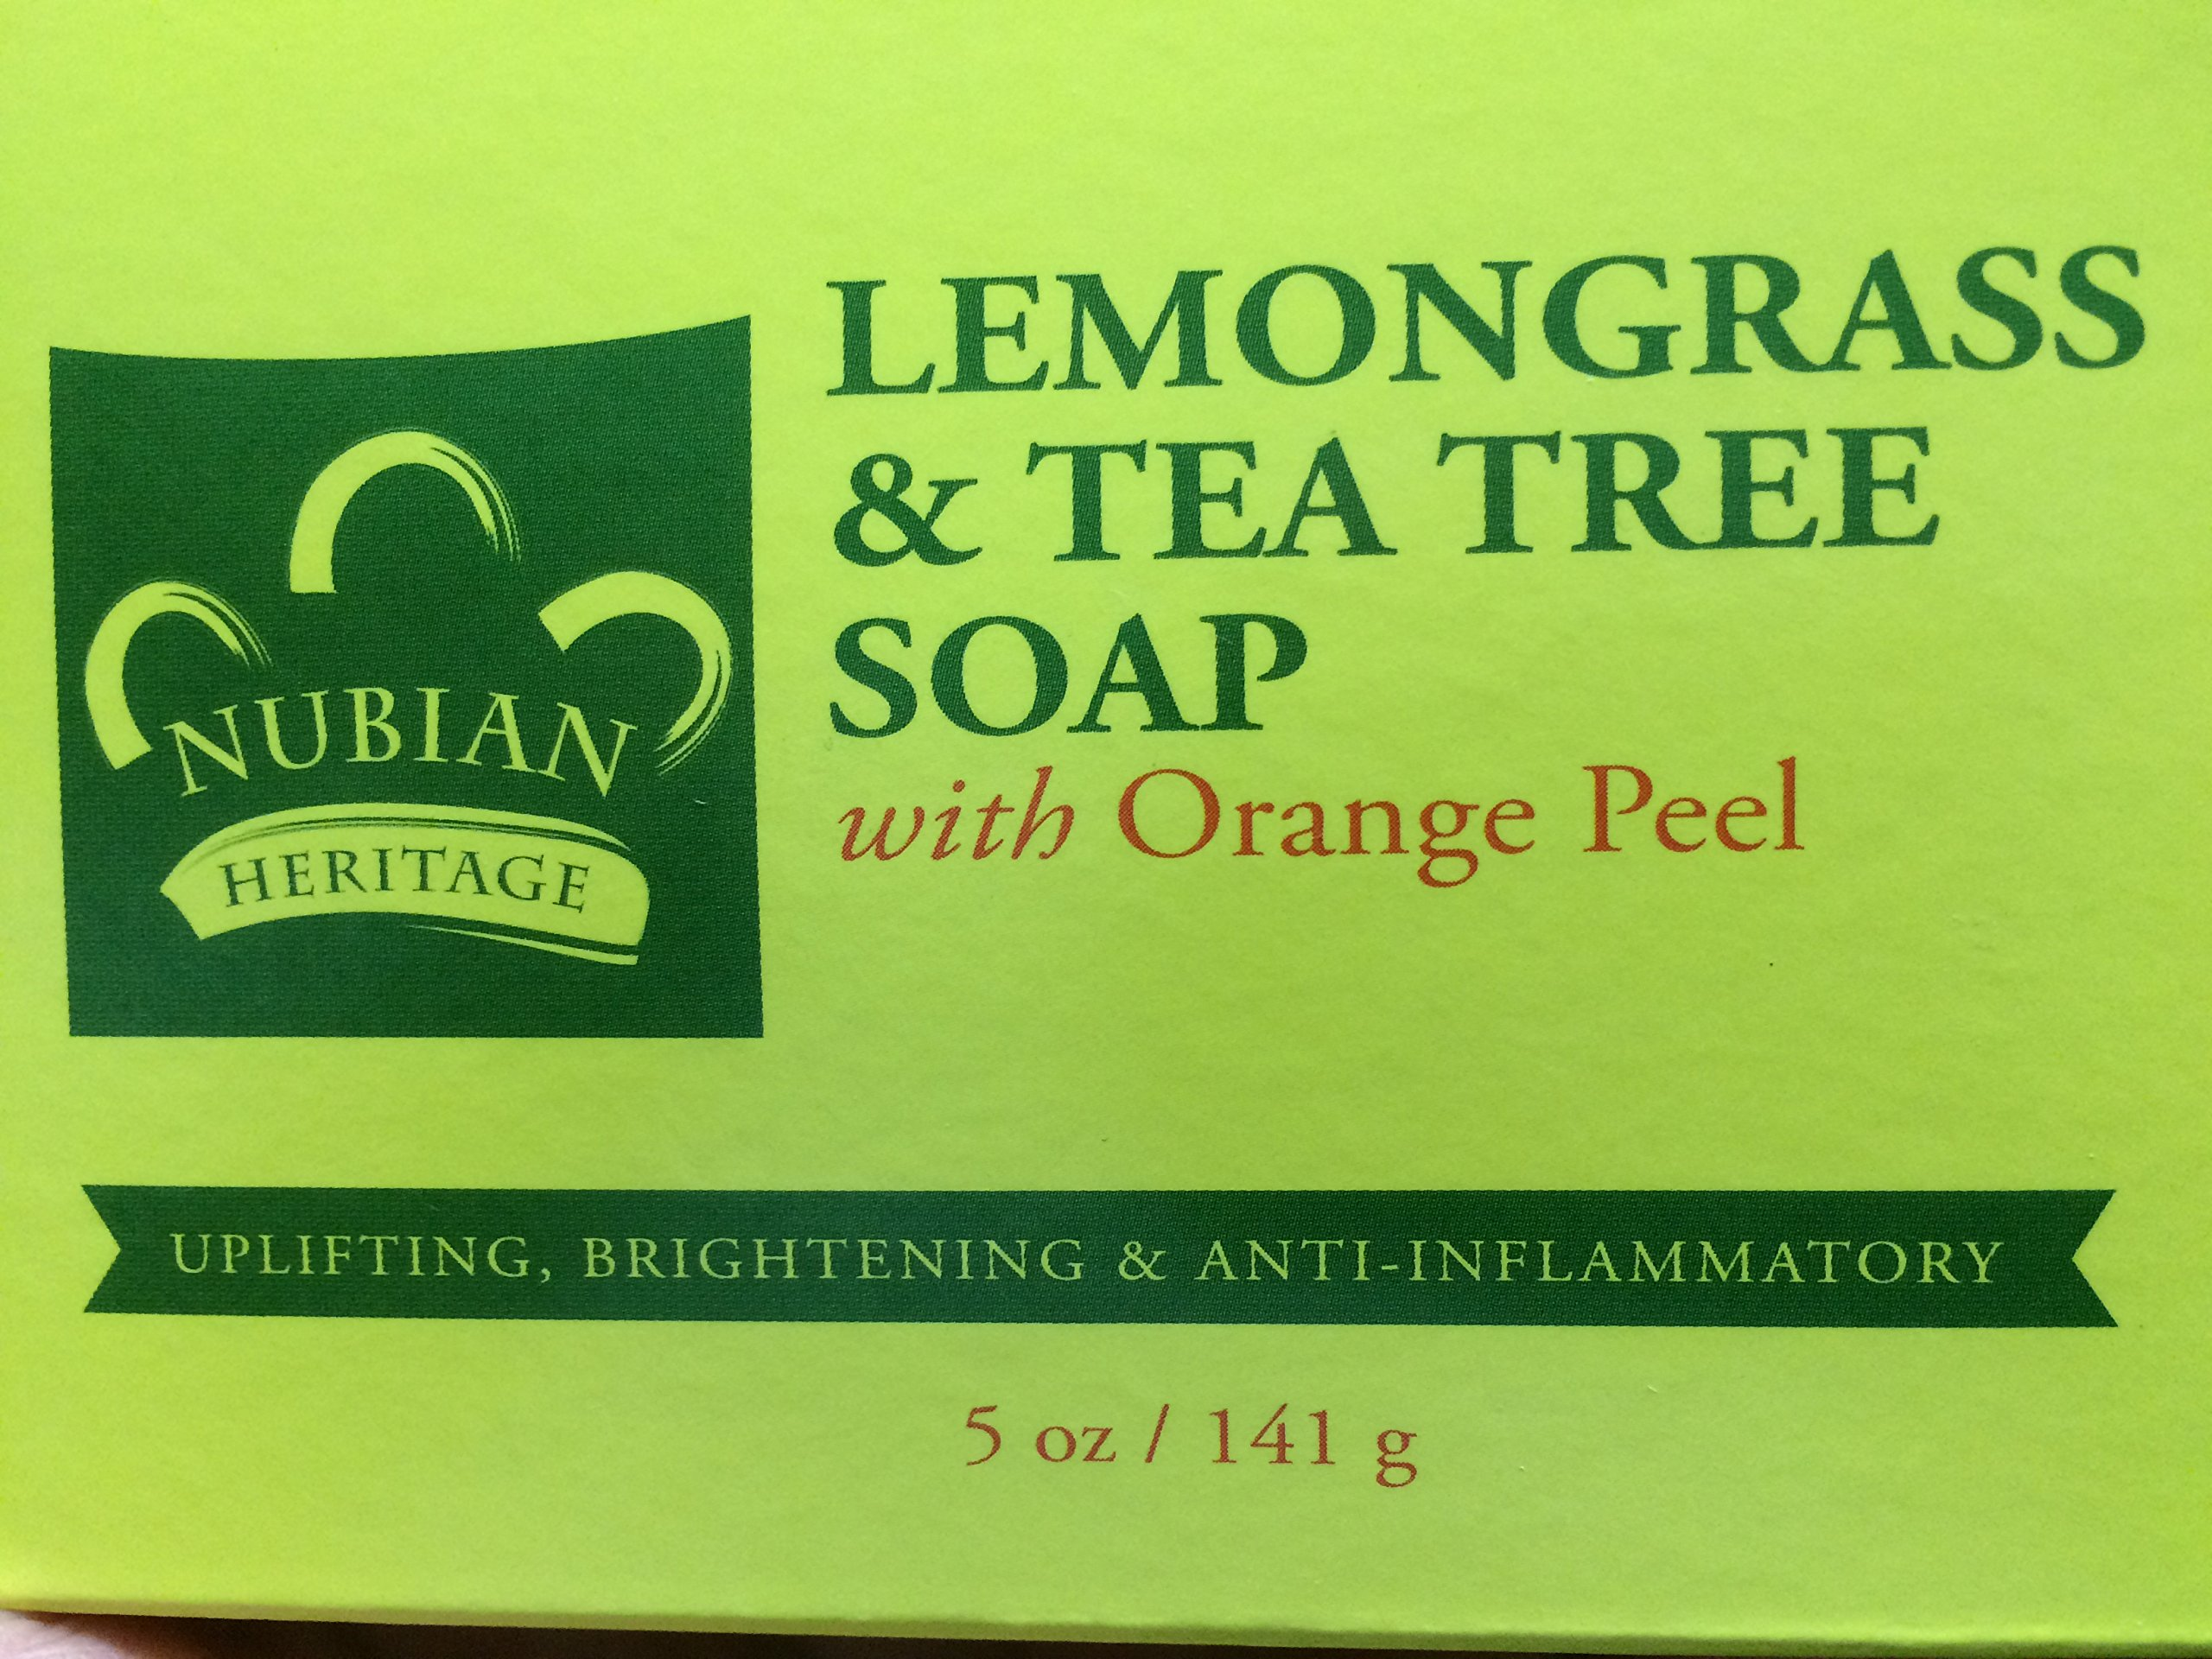 Lemongrass & Tea Tree Soap with Orange Peel 5 oz. (72) Bars